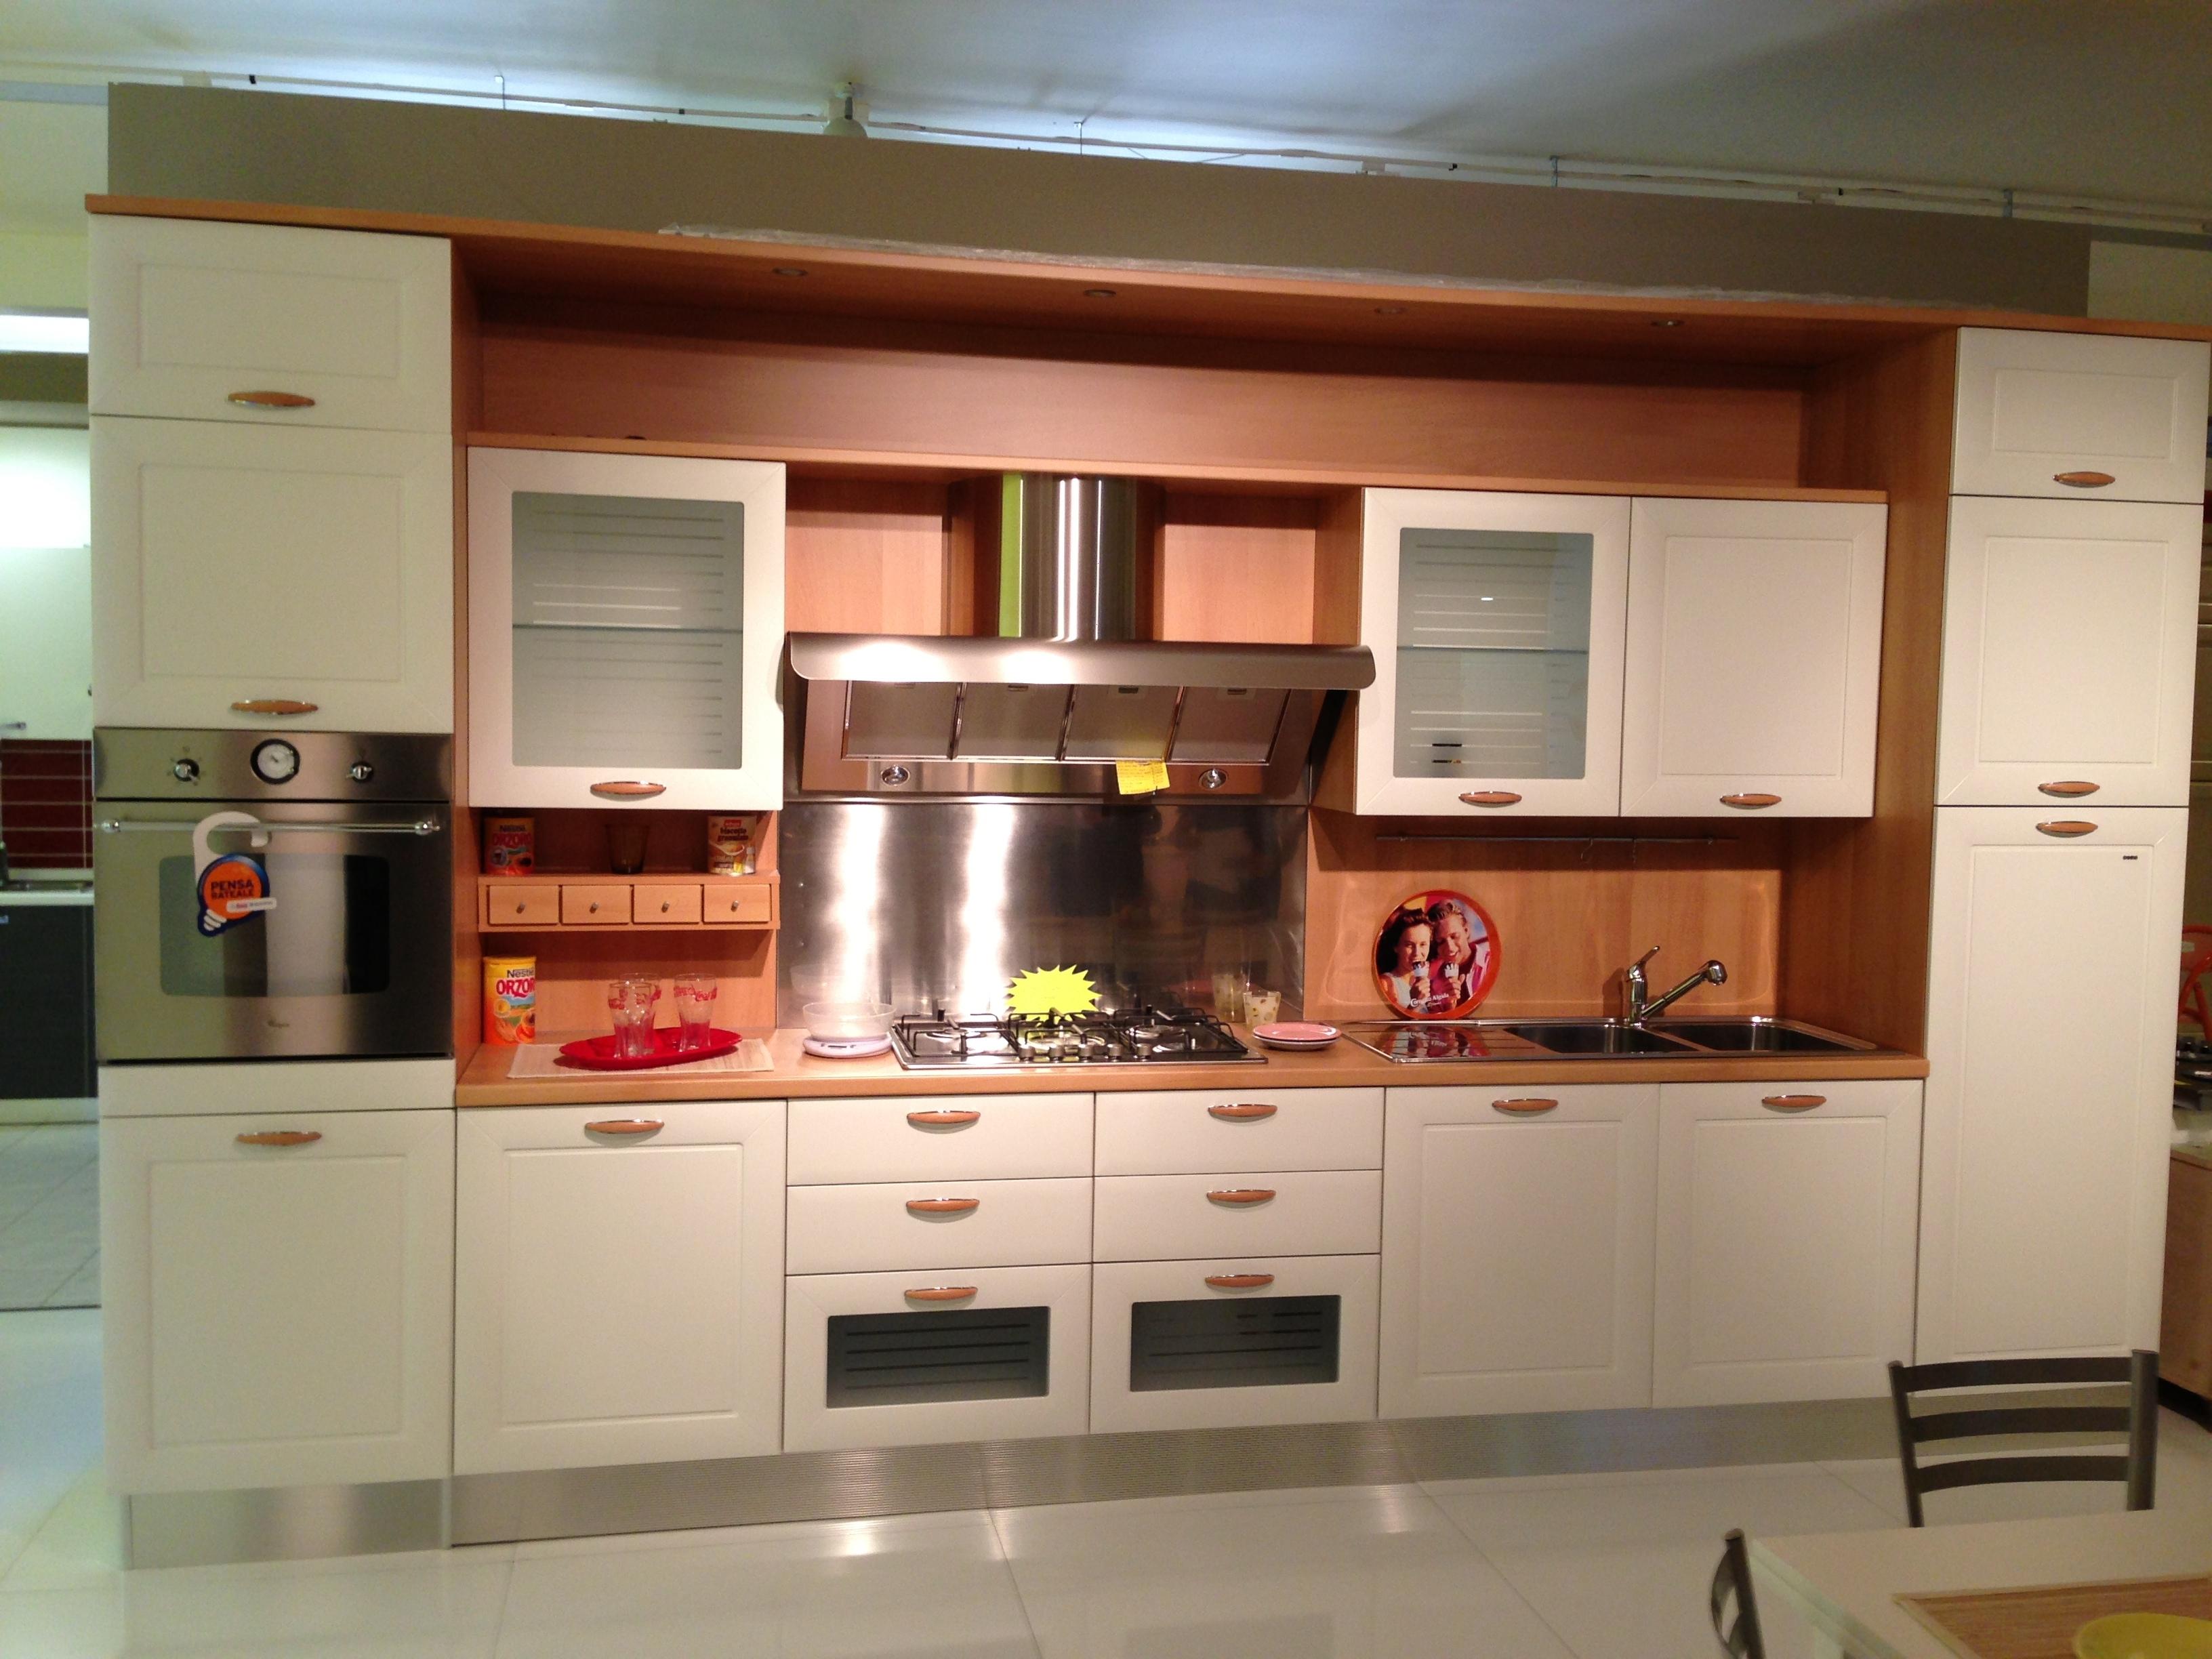 Paraschizzi cucina opinioni cucina colorato grande formato sugar with paraschizzi cucina - Cucine veneta opinioni ...